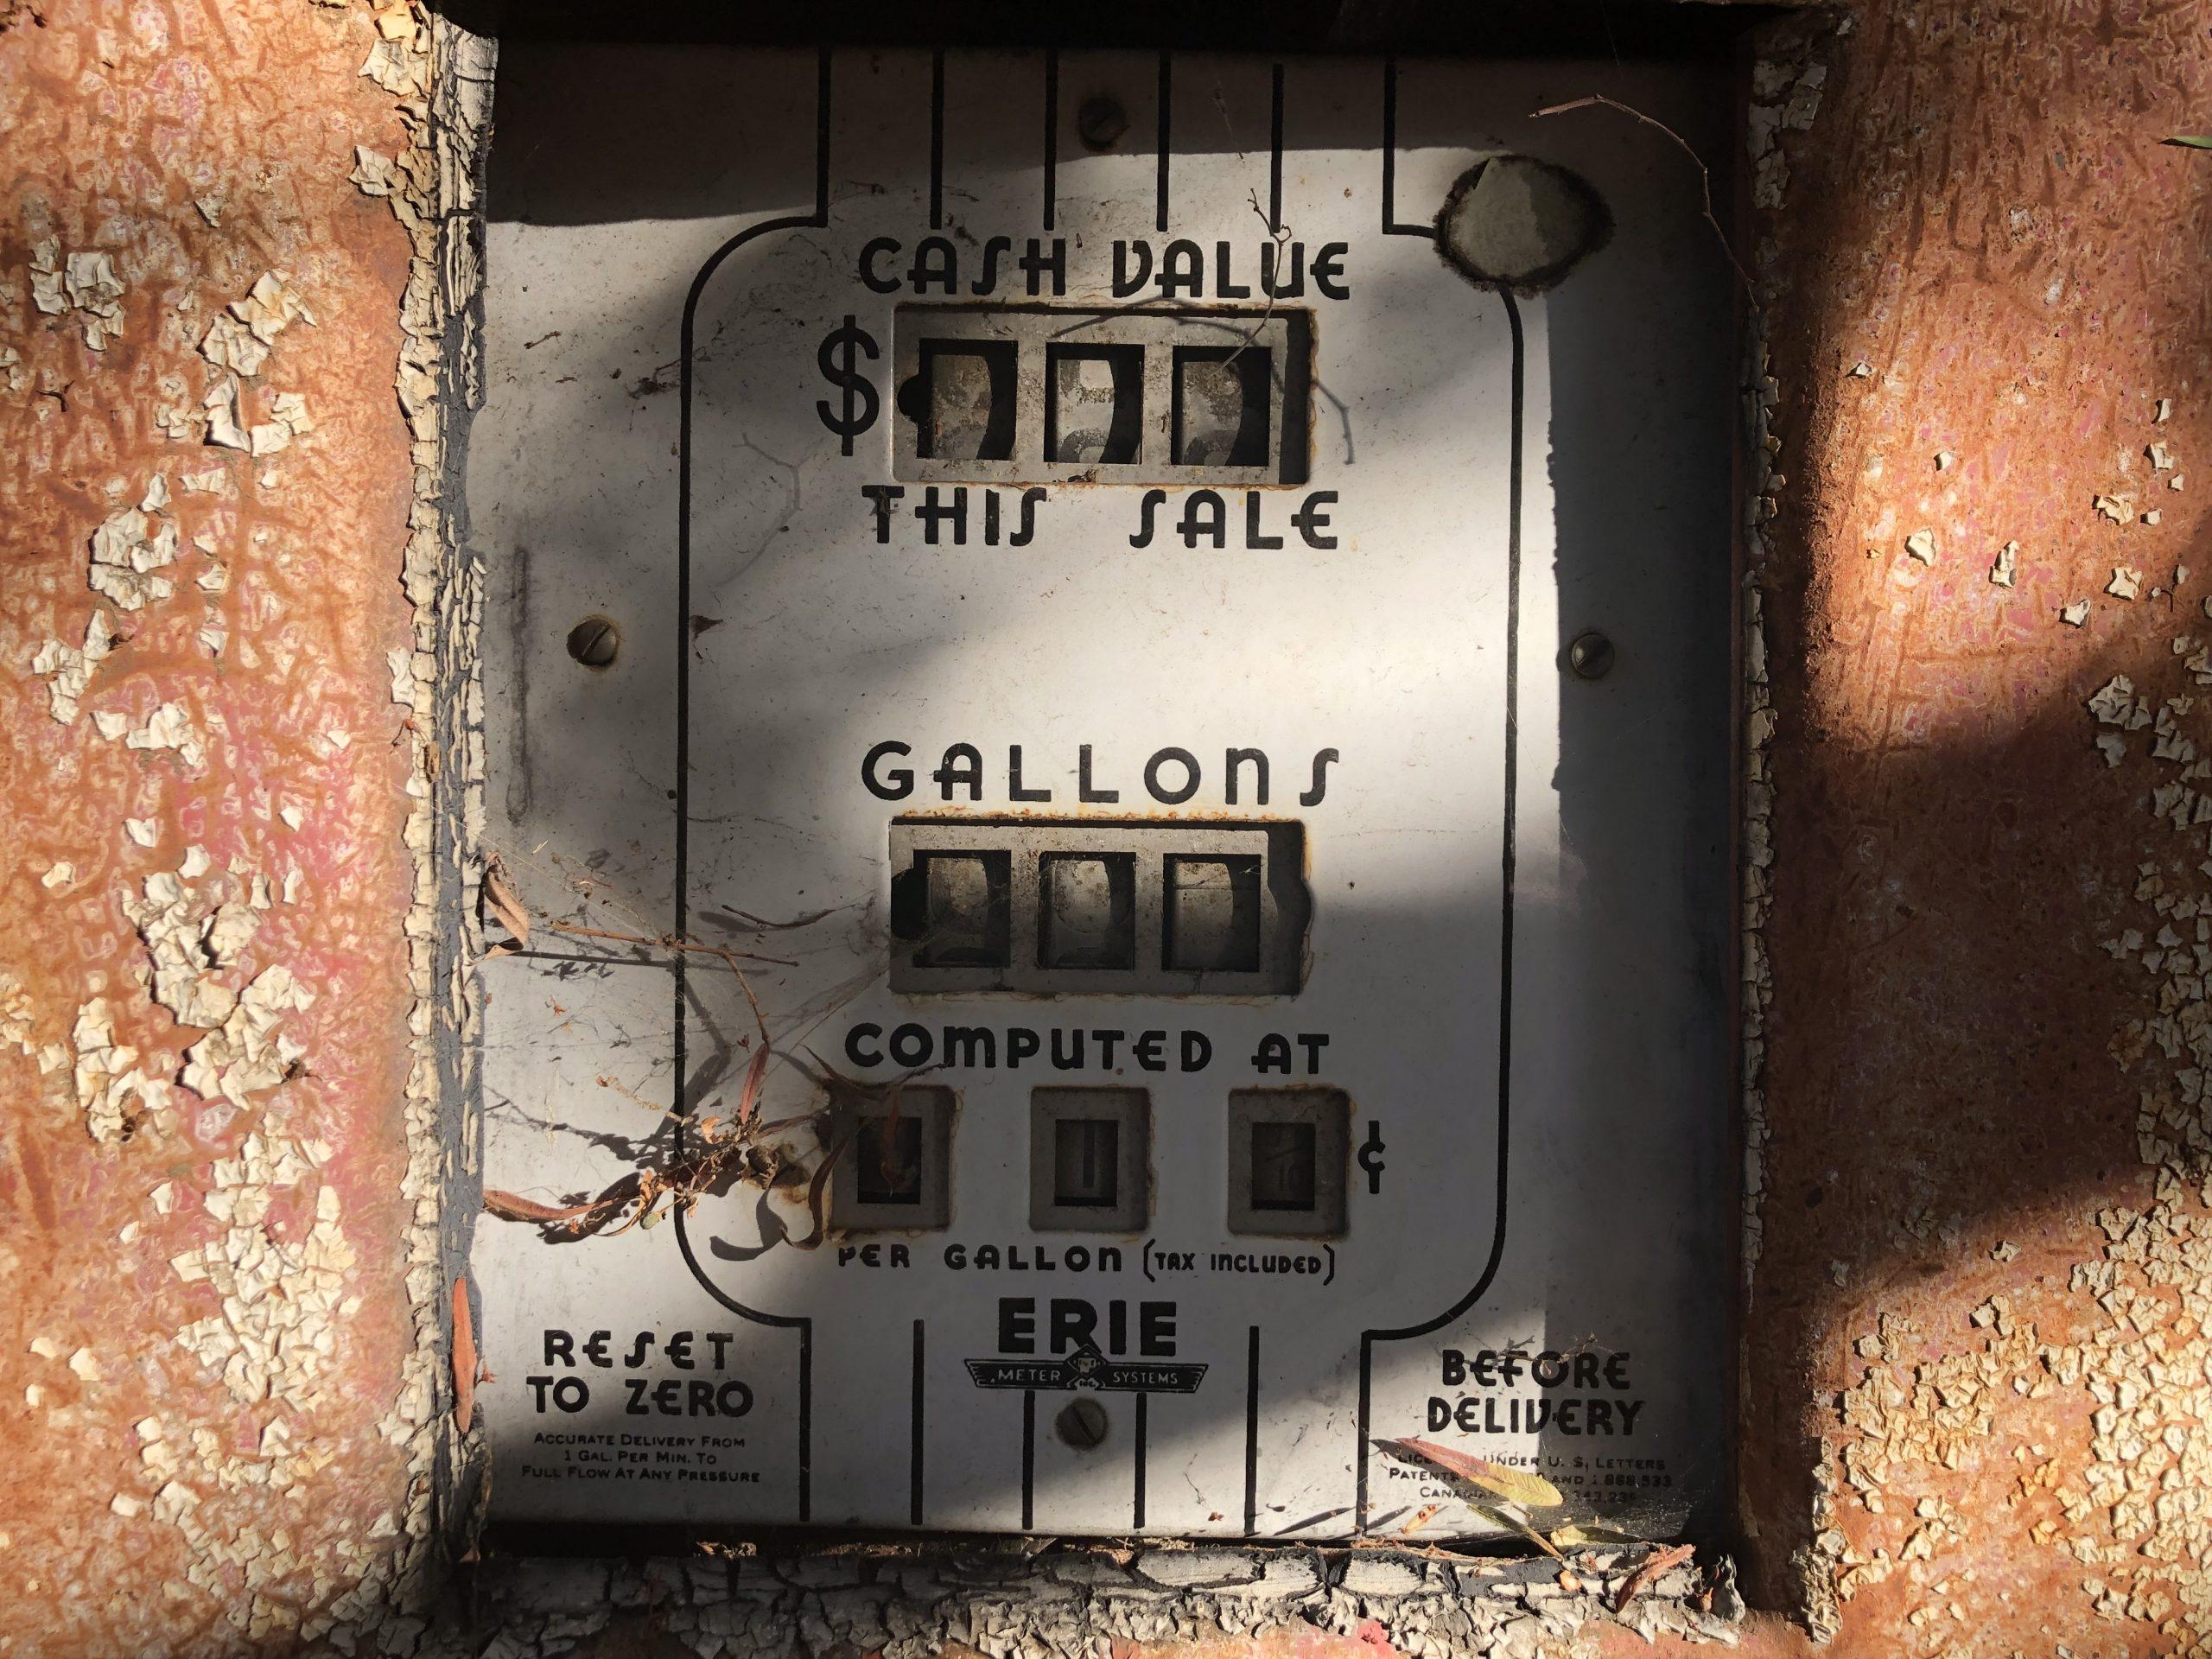 erie gasoline pump meter close up